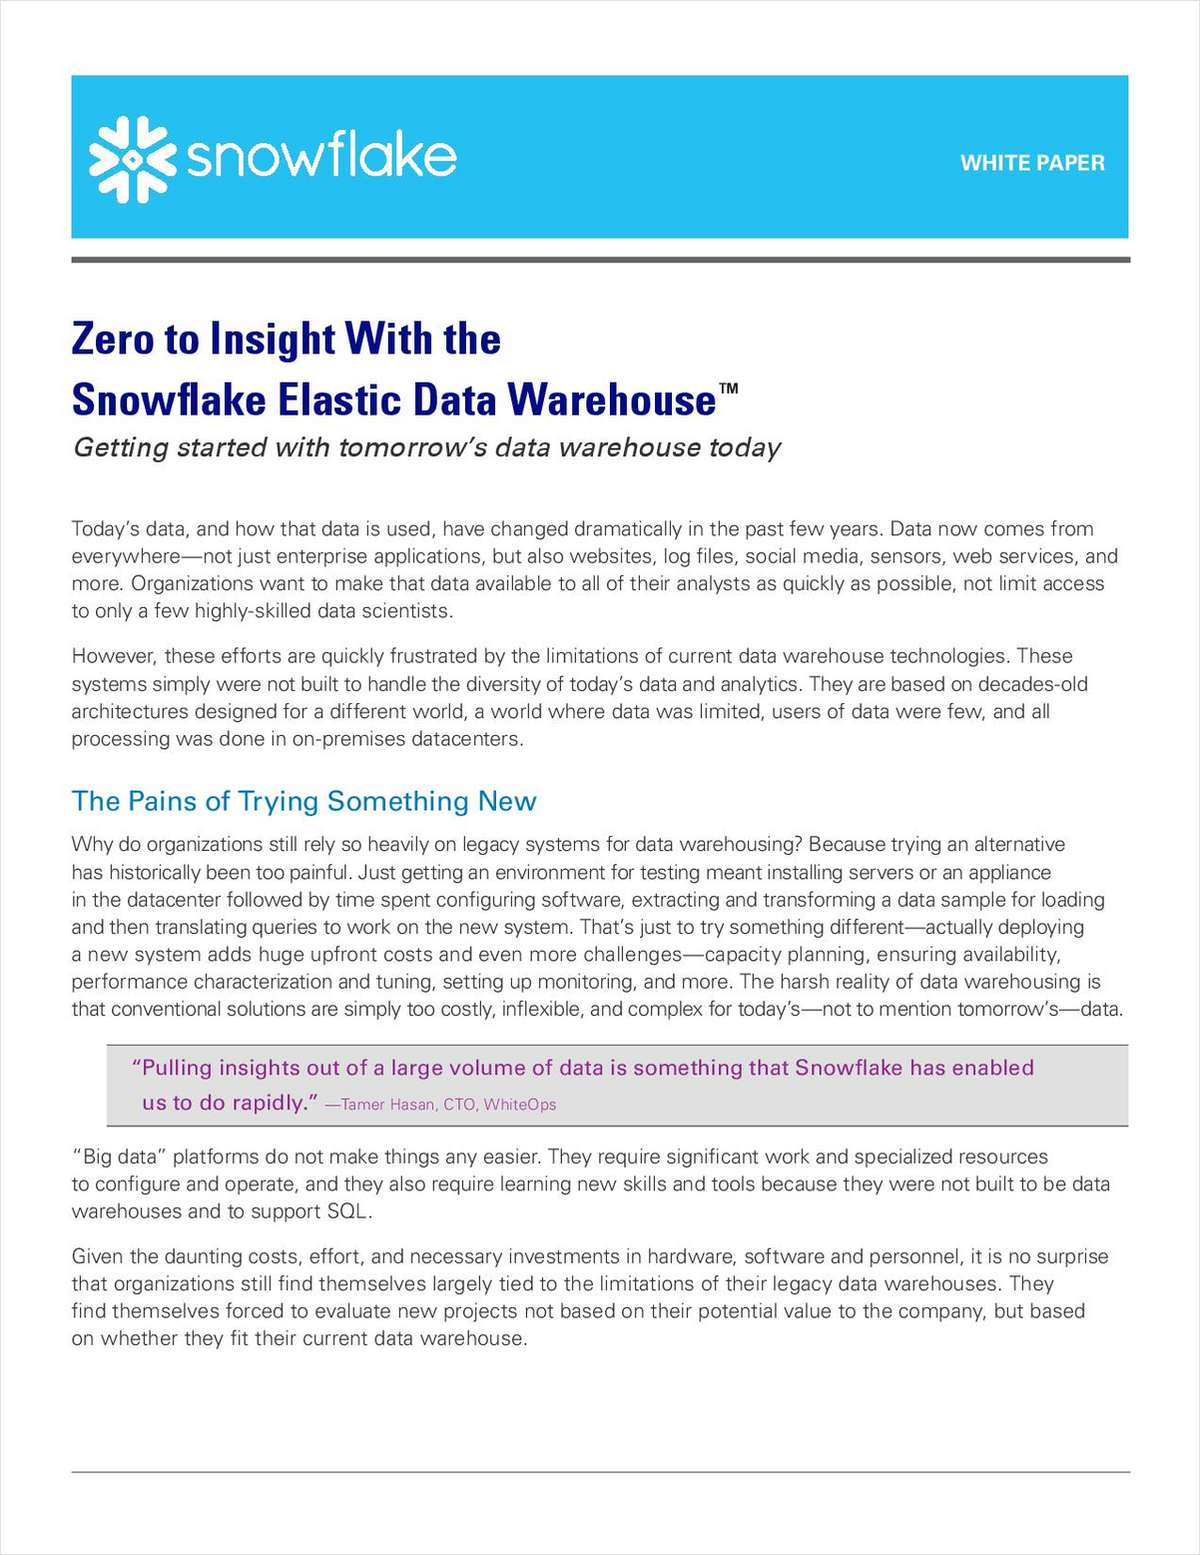 Zero to Insight with the Snowflake Elastic Data Warehouse™